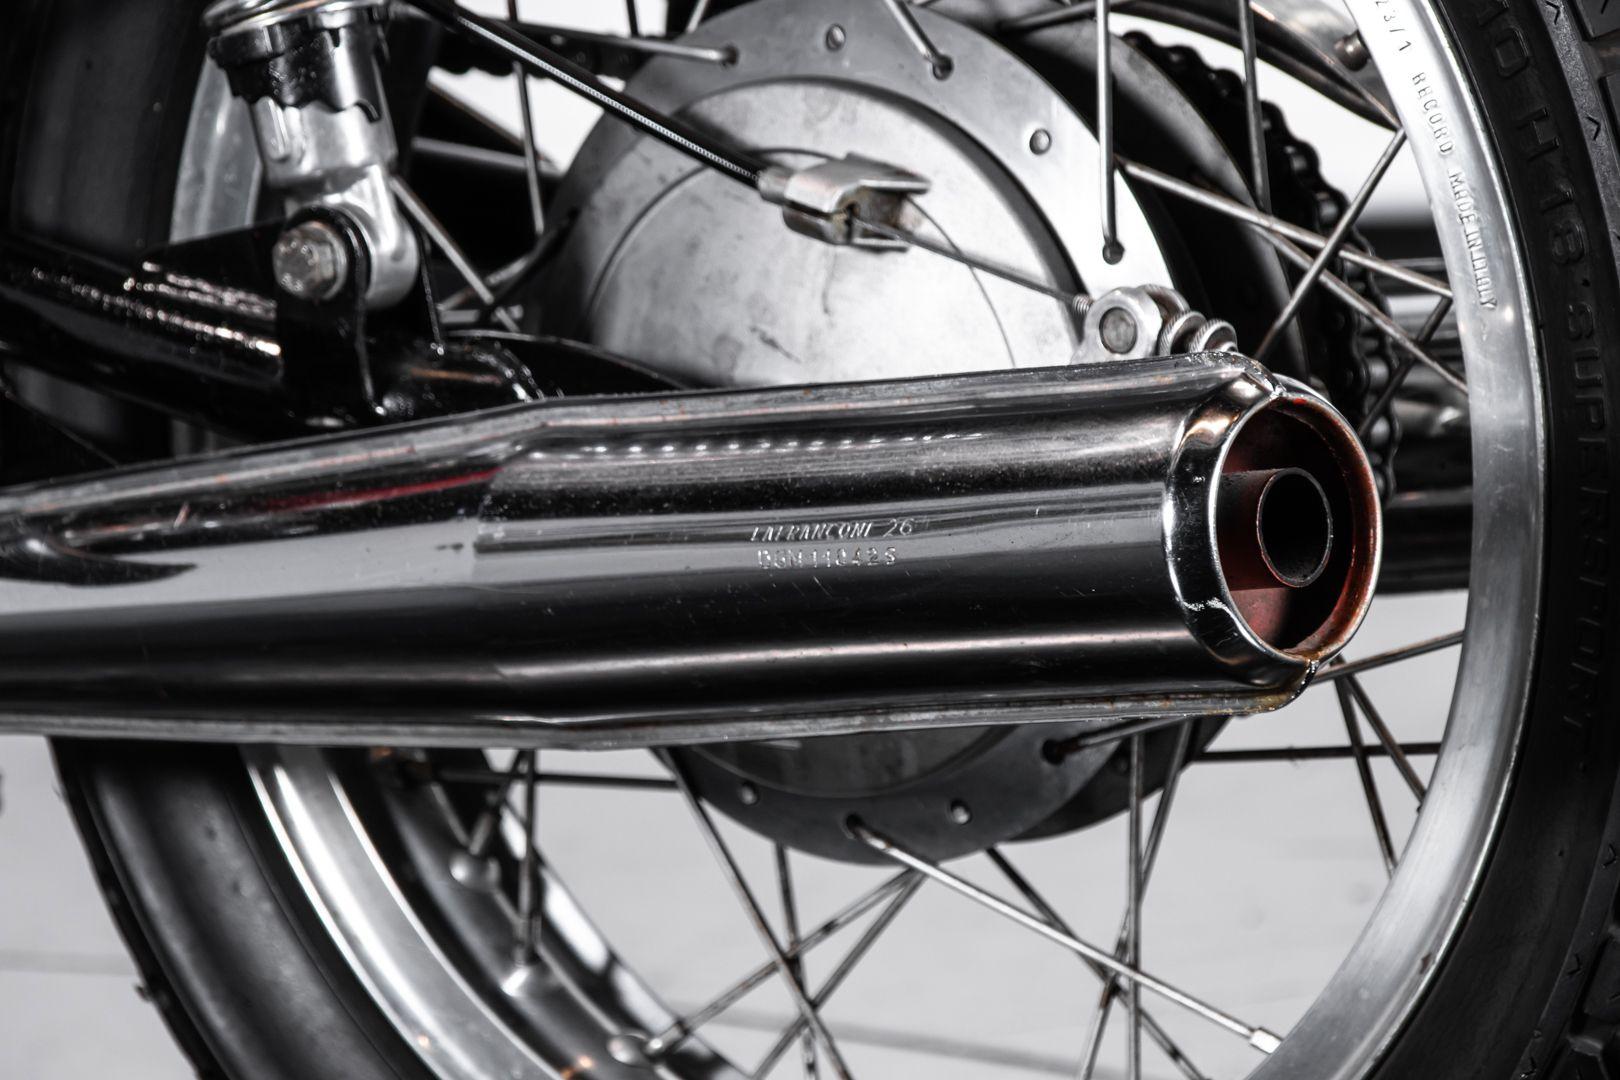 1975 Moto Morini Sport 350 78710